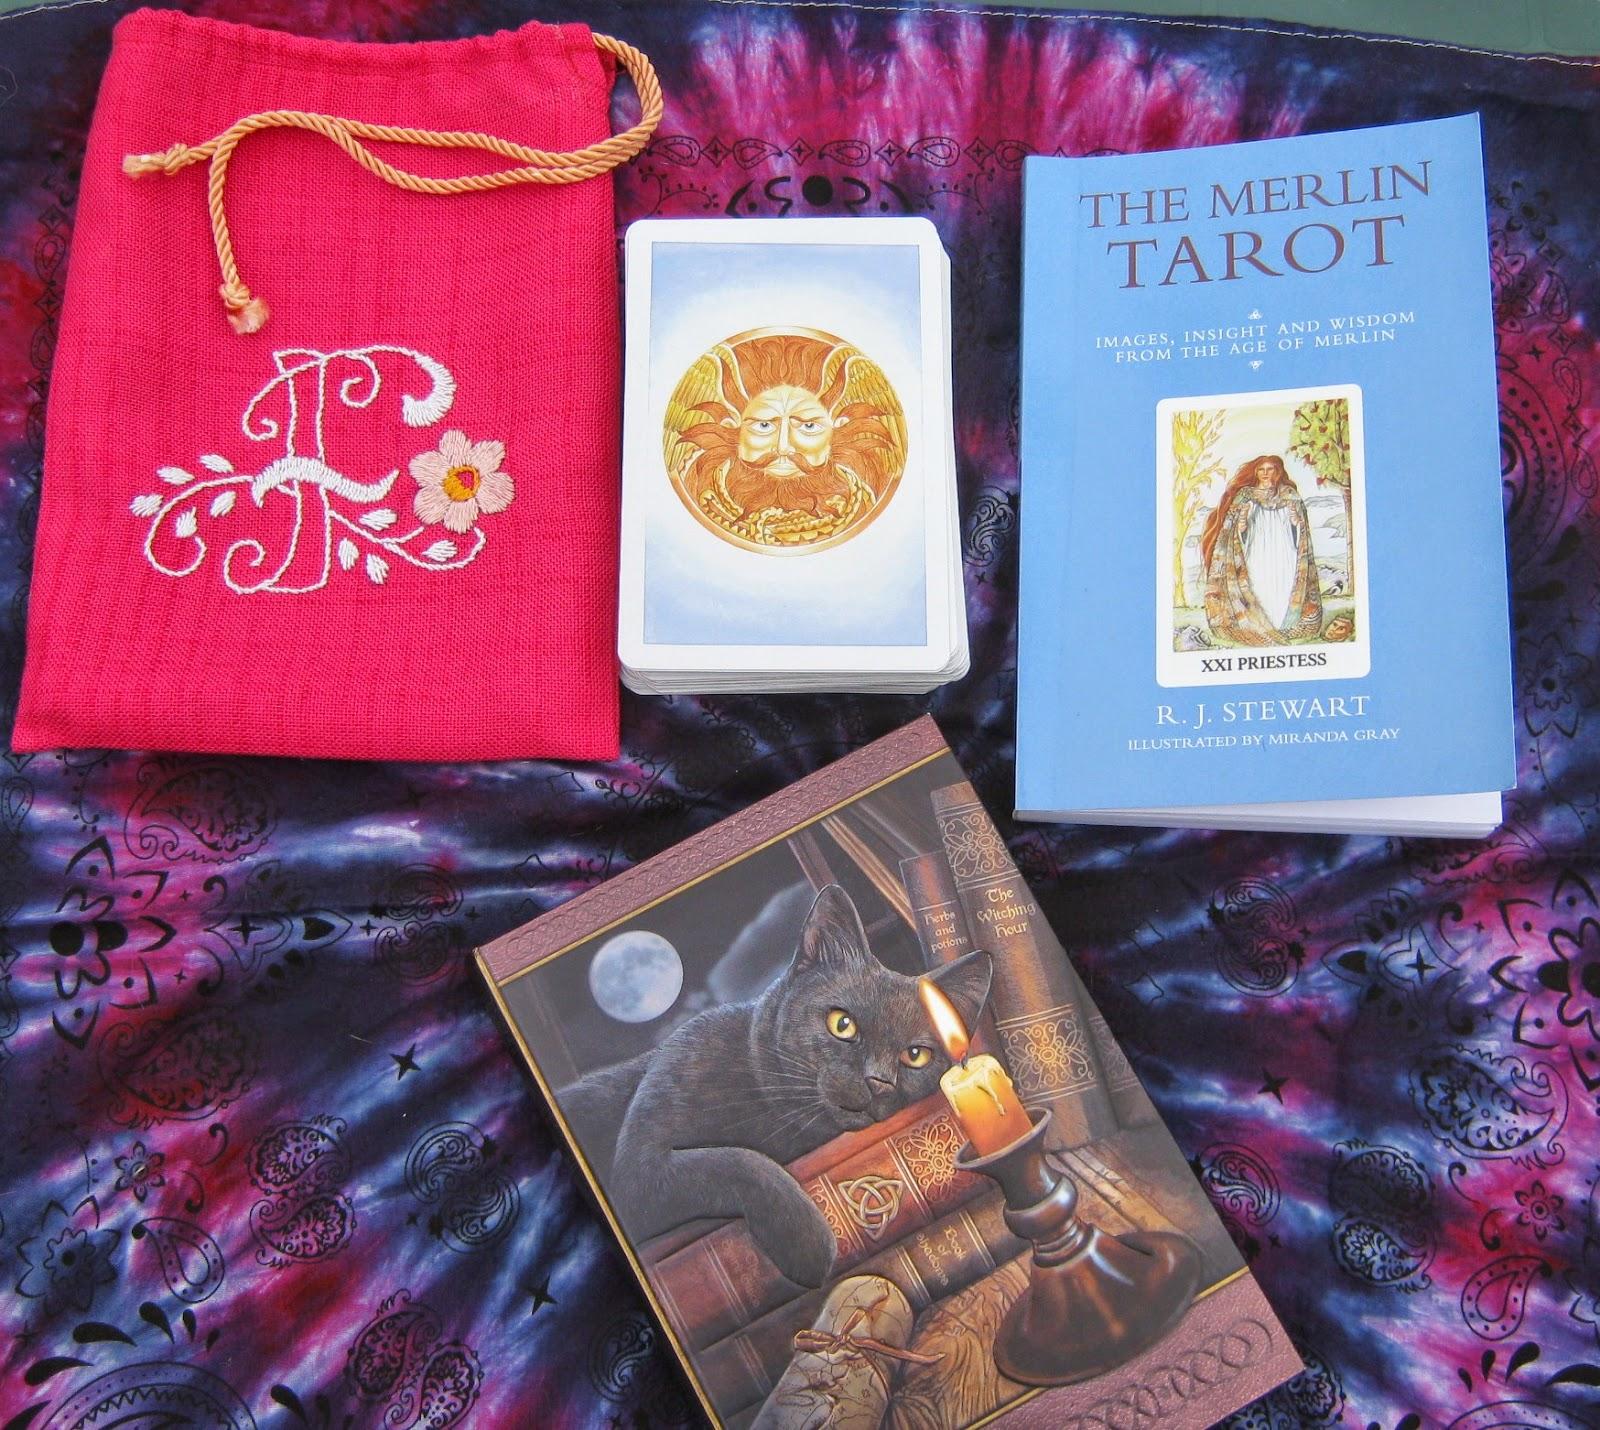 Pook's Hill: The Merlin Tarot